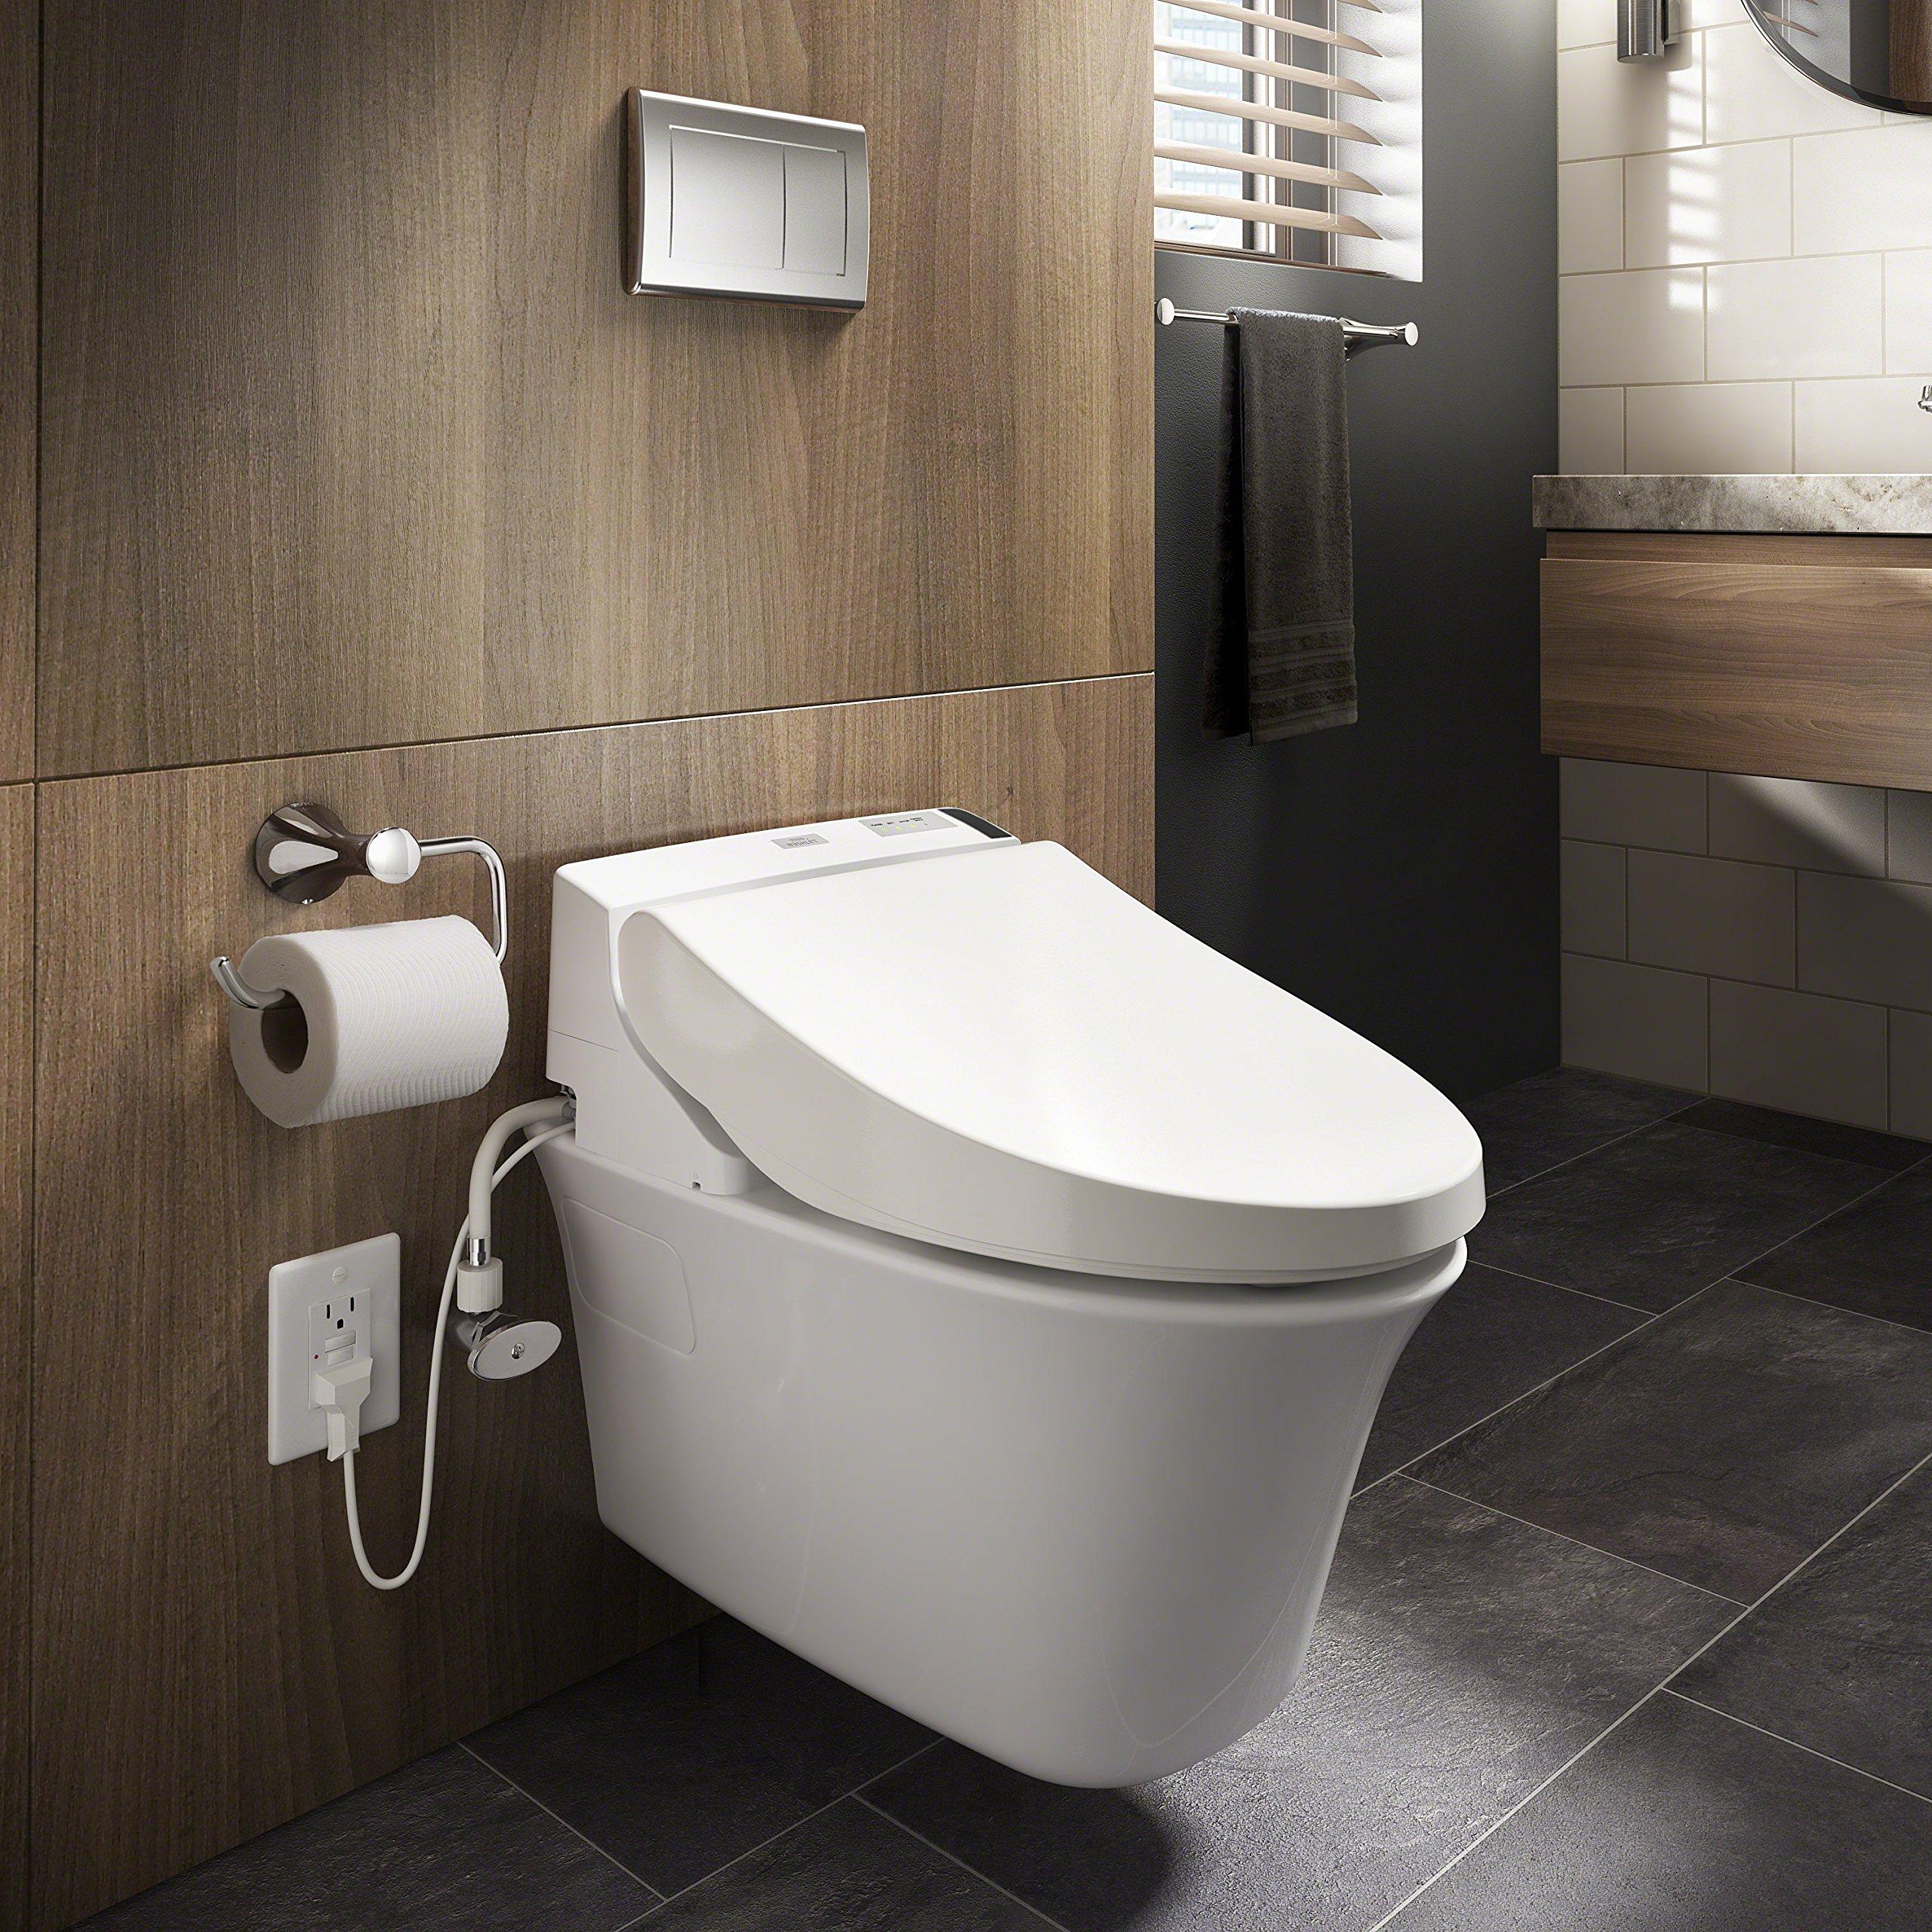 TOTO Washlet C200 Elongated Bidet Toilet Seat with PreMist, Cotton White - SW2044#01 by TOTO (Image #9)